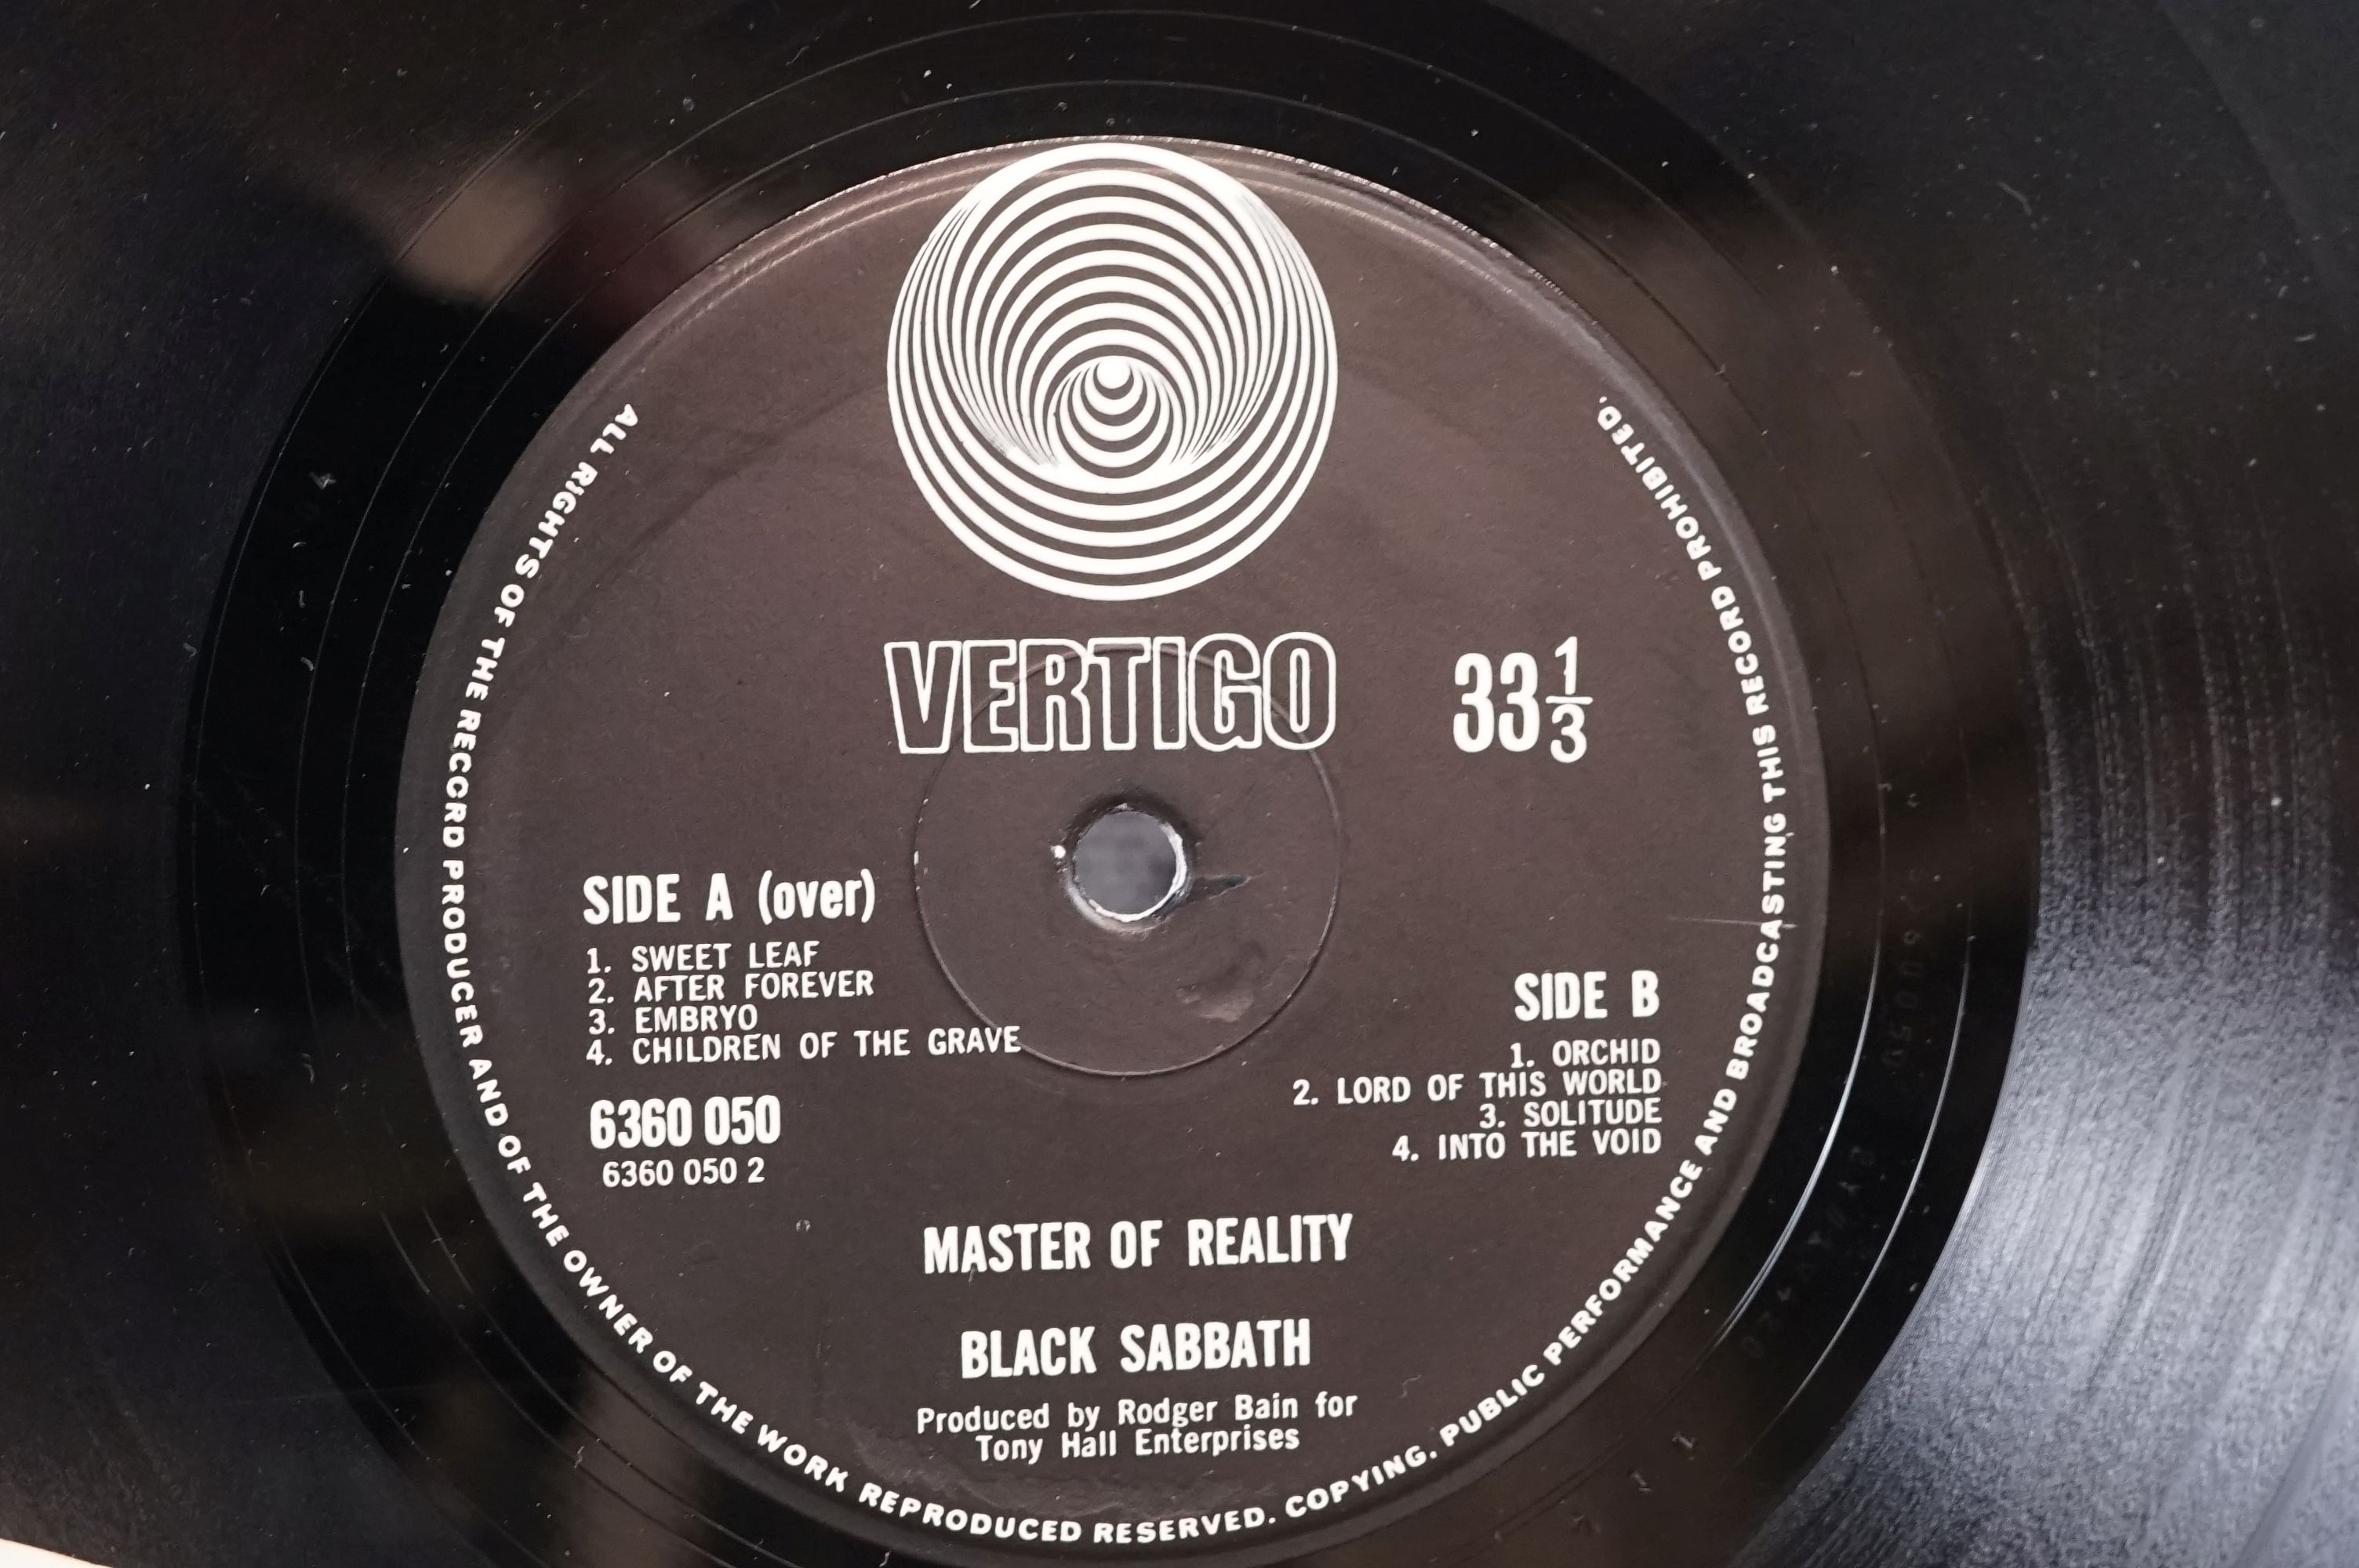 Vinyl - Black Sabbath - Master Of Reality. Original UK 1971 1st Black label, Swirl Vertigo label - Image 5 of 5